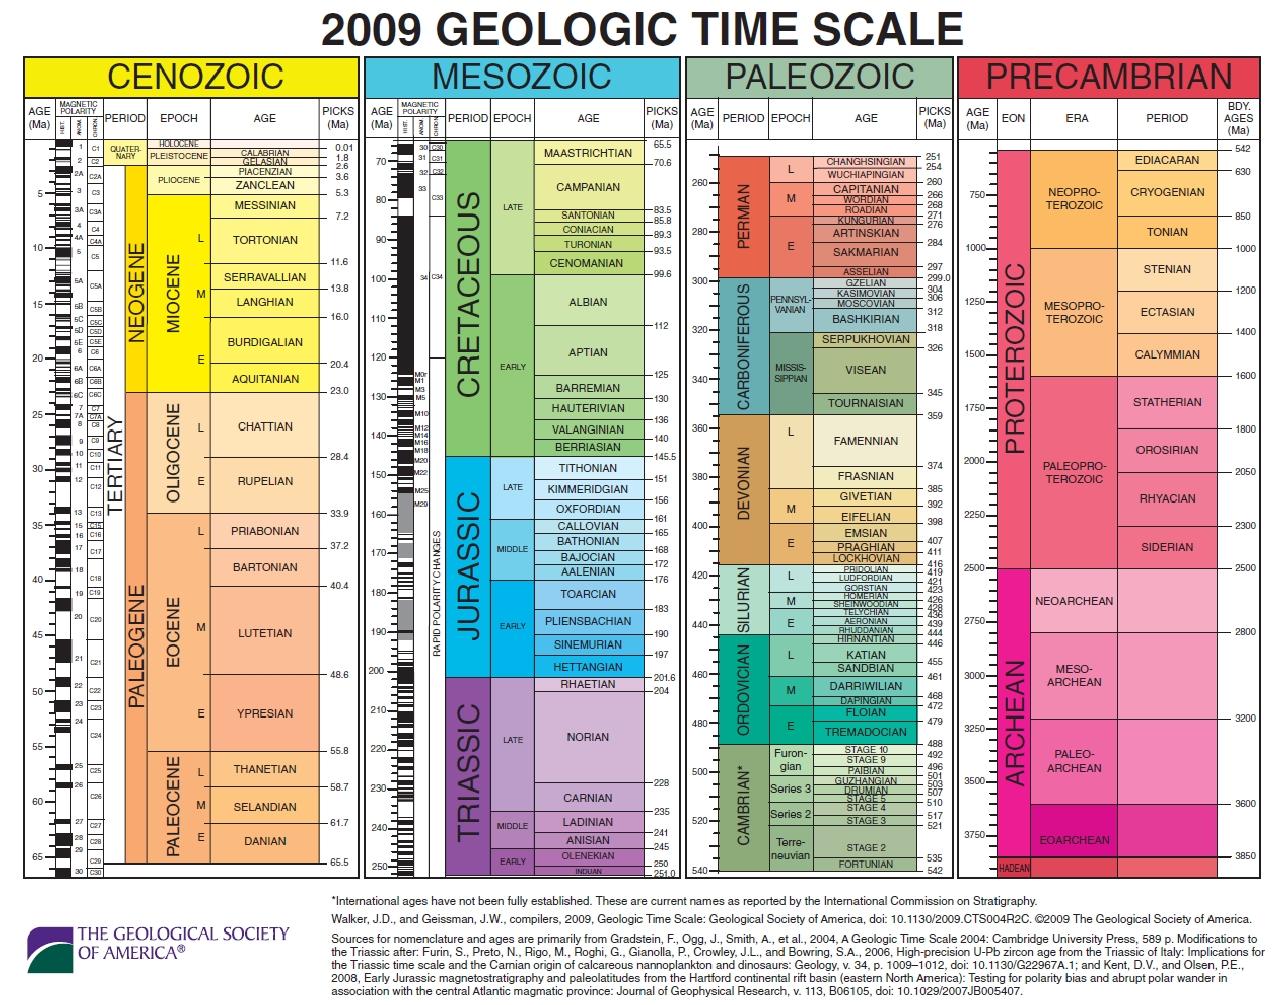 Gc5zjk8 Cut Thru Time Earthcache In Virginia United States Created By Biblemanrick